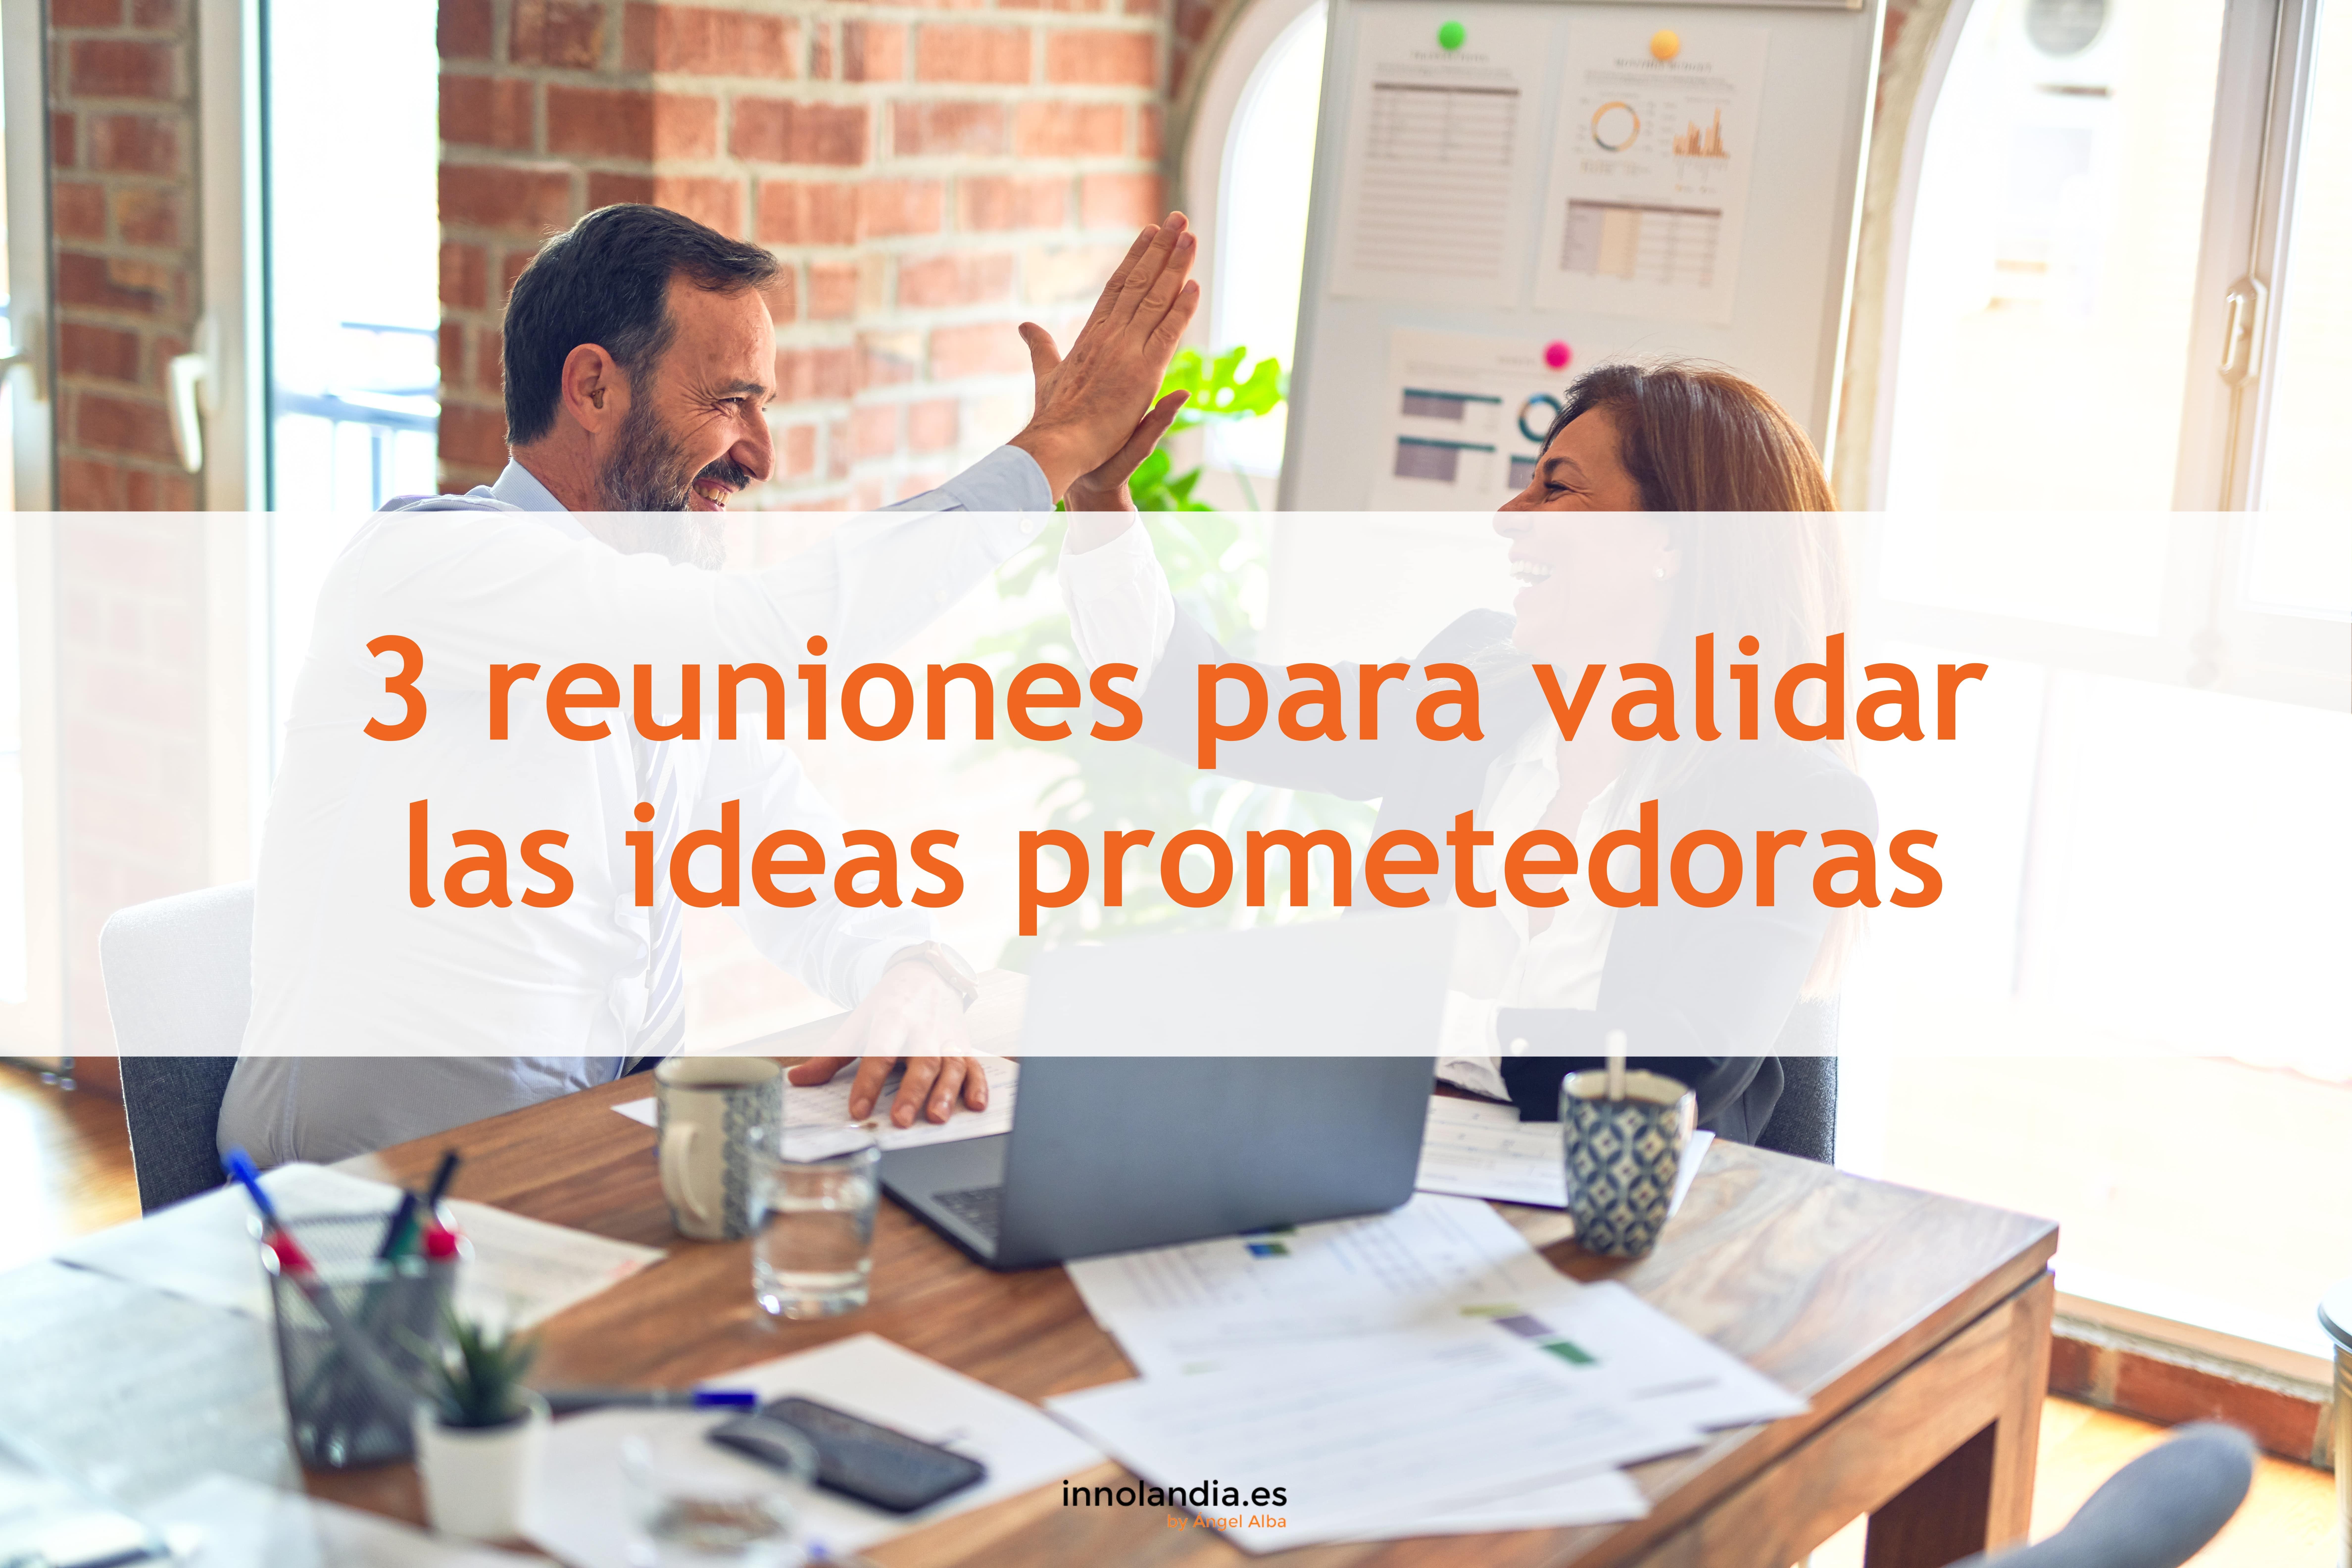 3 reuniones para validar las ideas prometedoras